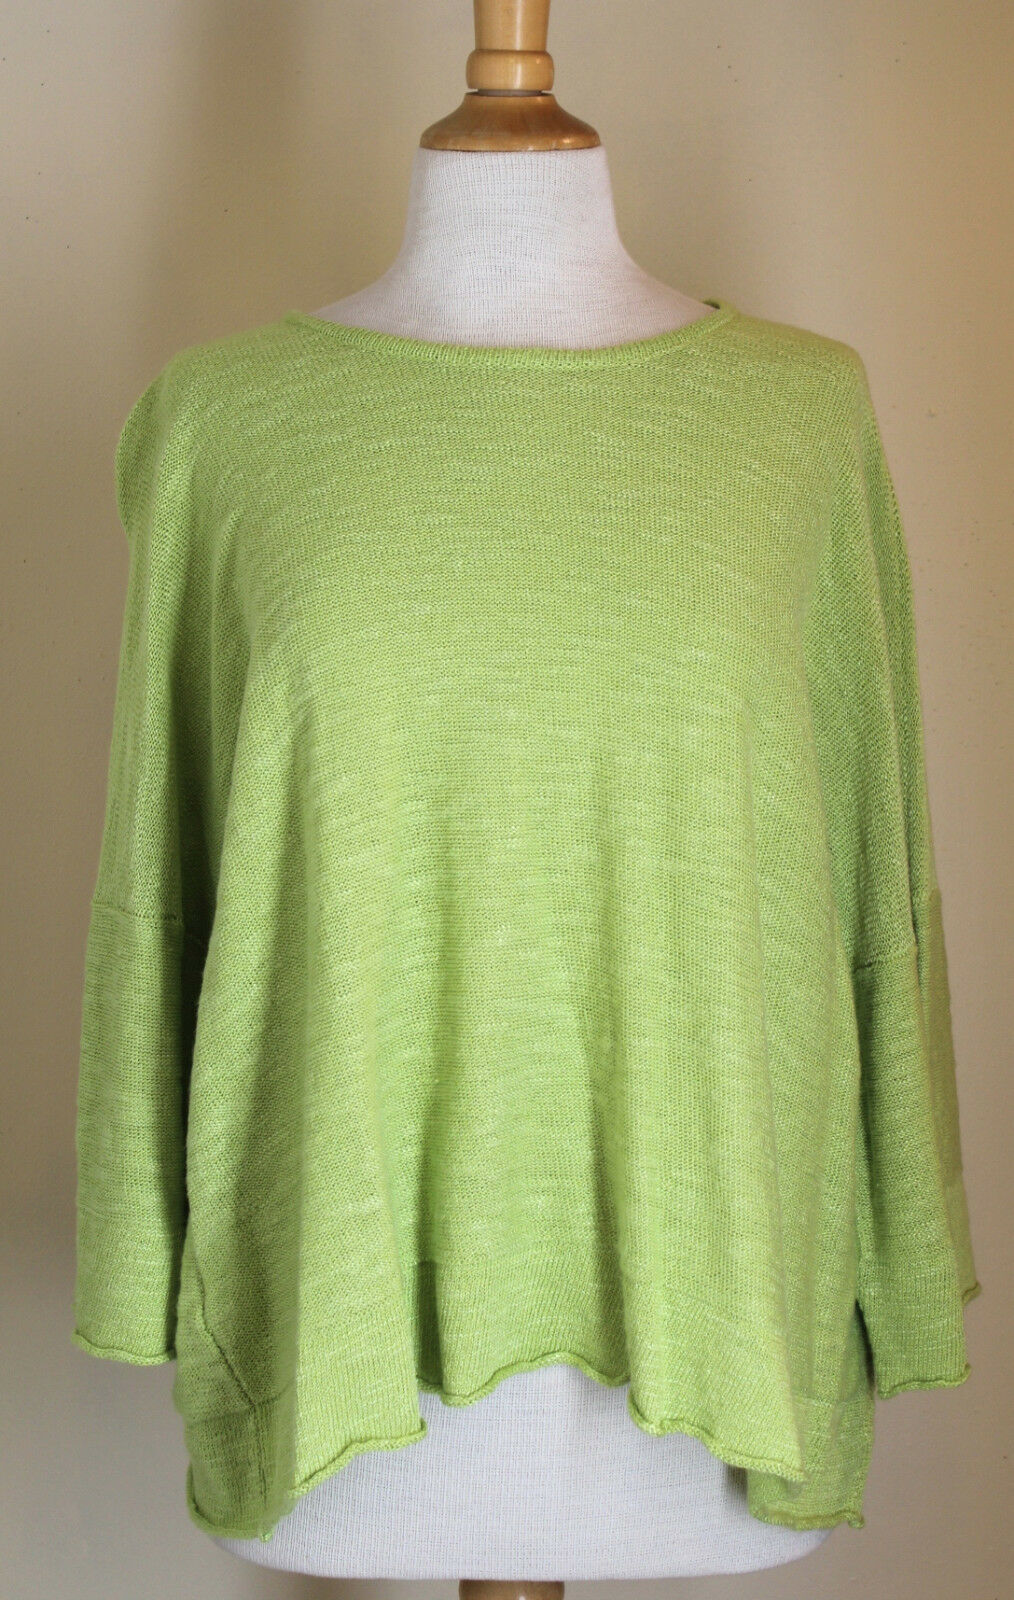 NEW Eskandar Citrus Citrus Citrus Lime Green Hand Loomed Linen Blend 3 4 Sleeve Sweater Sz OS 44e24f